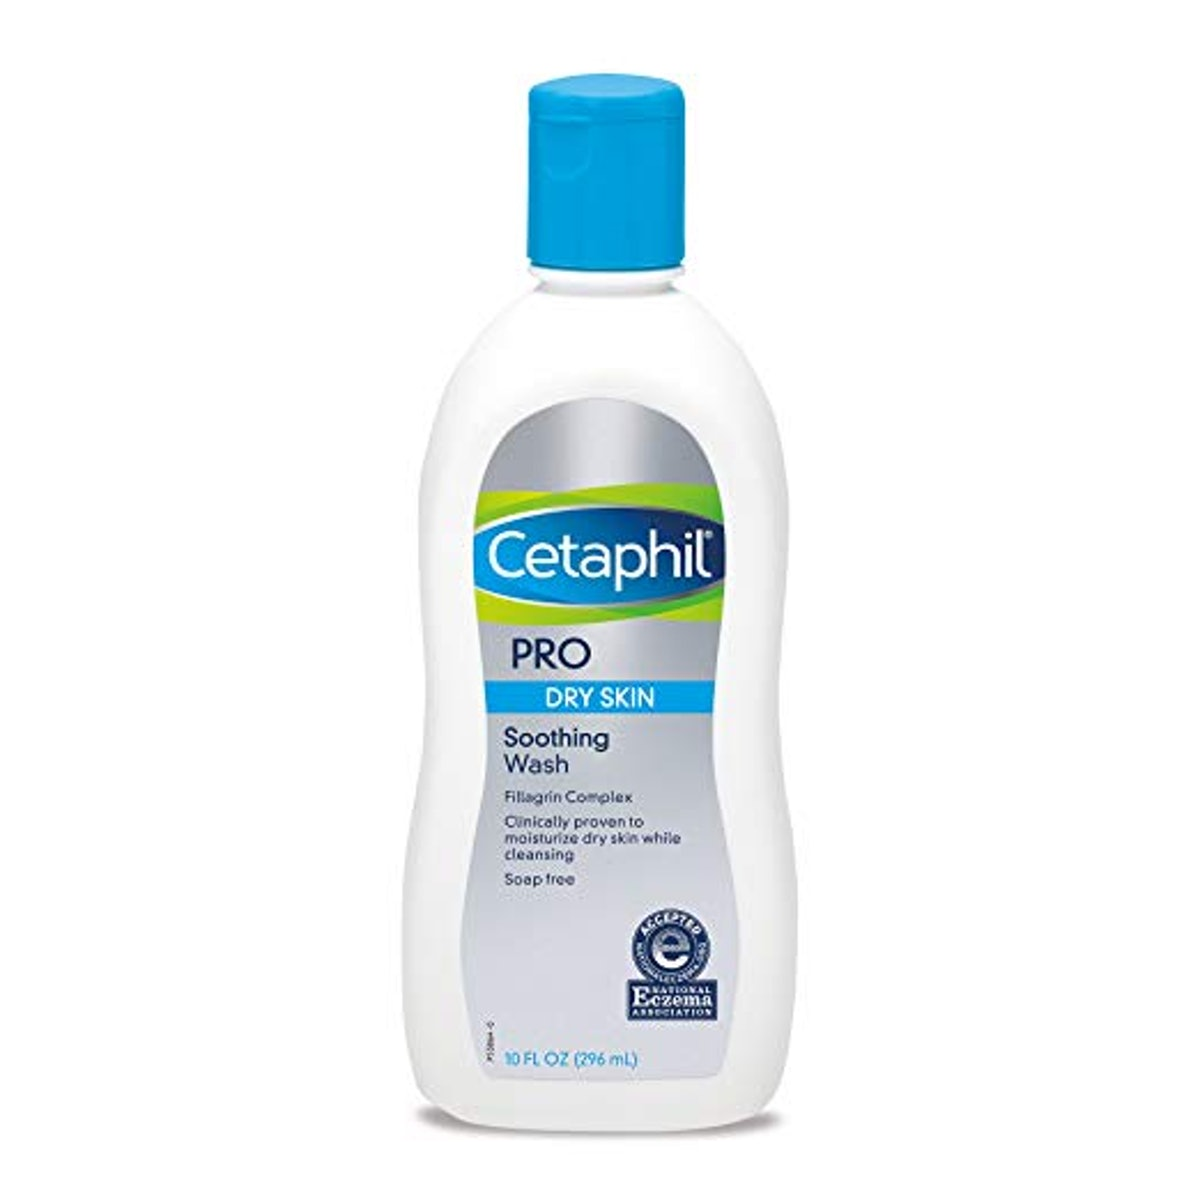 Cetaphil Pro Soothing Wash